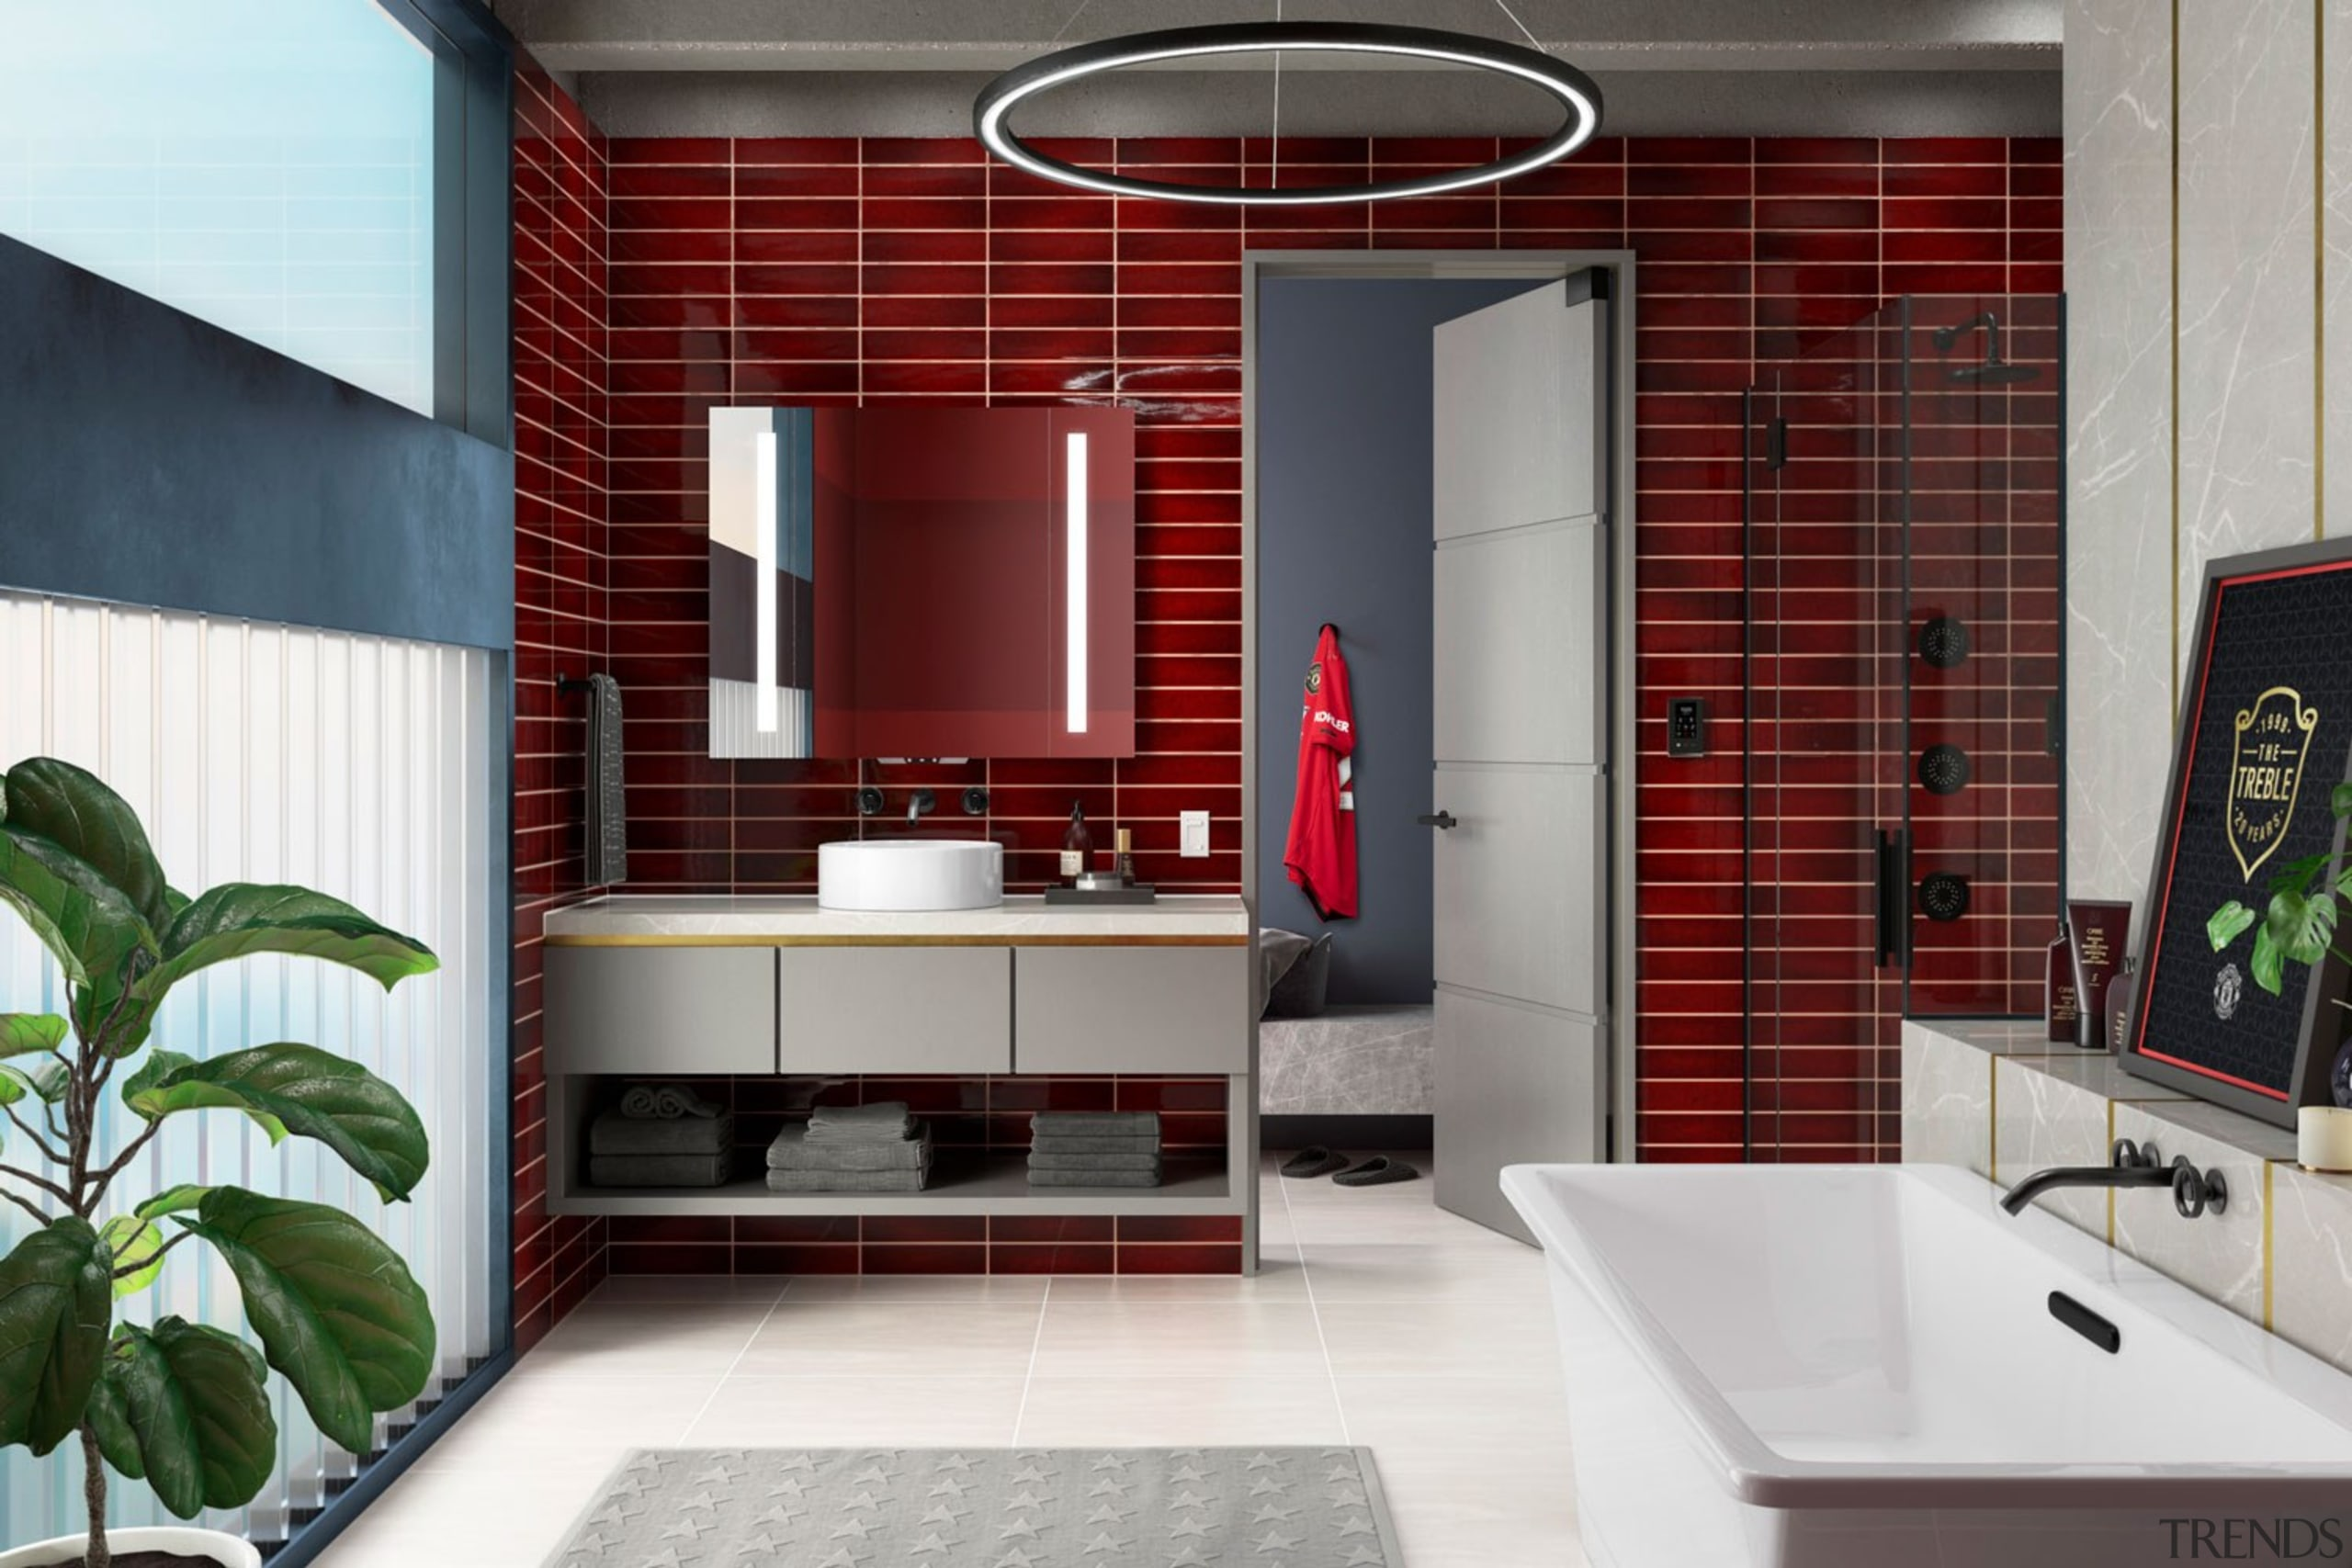 The Kohler design team sought to embrace Manchester architecture, bathroom, building, cabinetry, ceiling, floor, flooring, furniture, home, house, interior design, living room, property, real estate, red, room, sink, tile, white, red